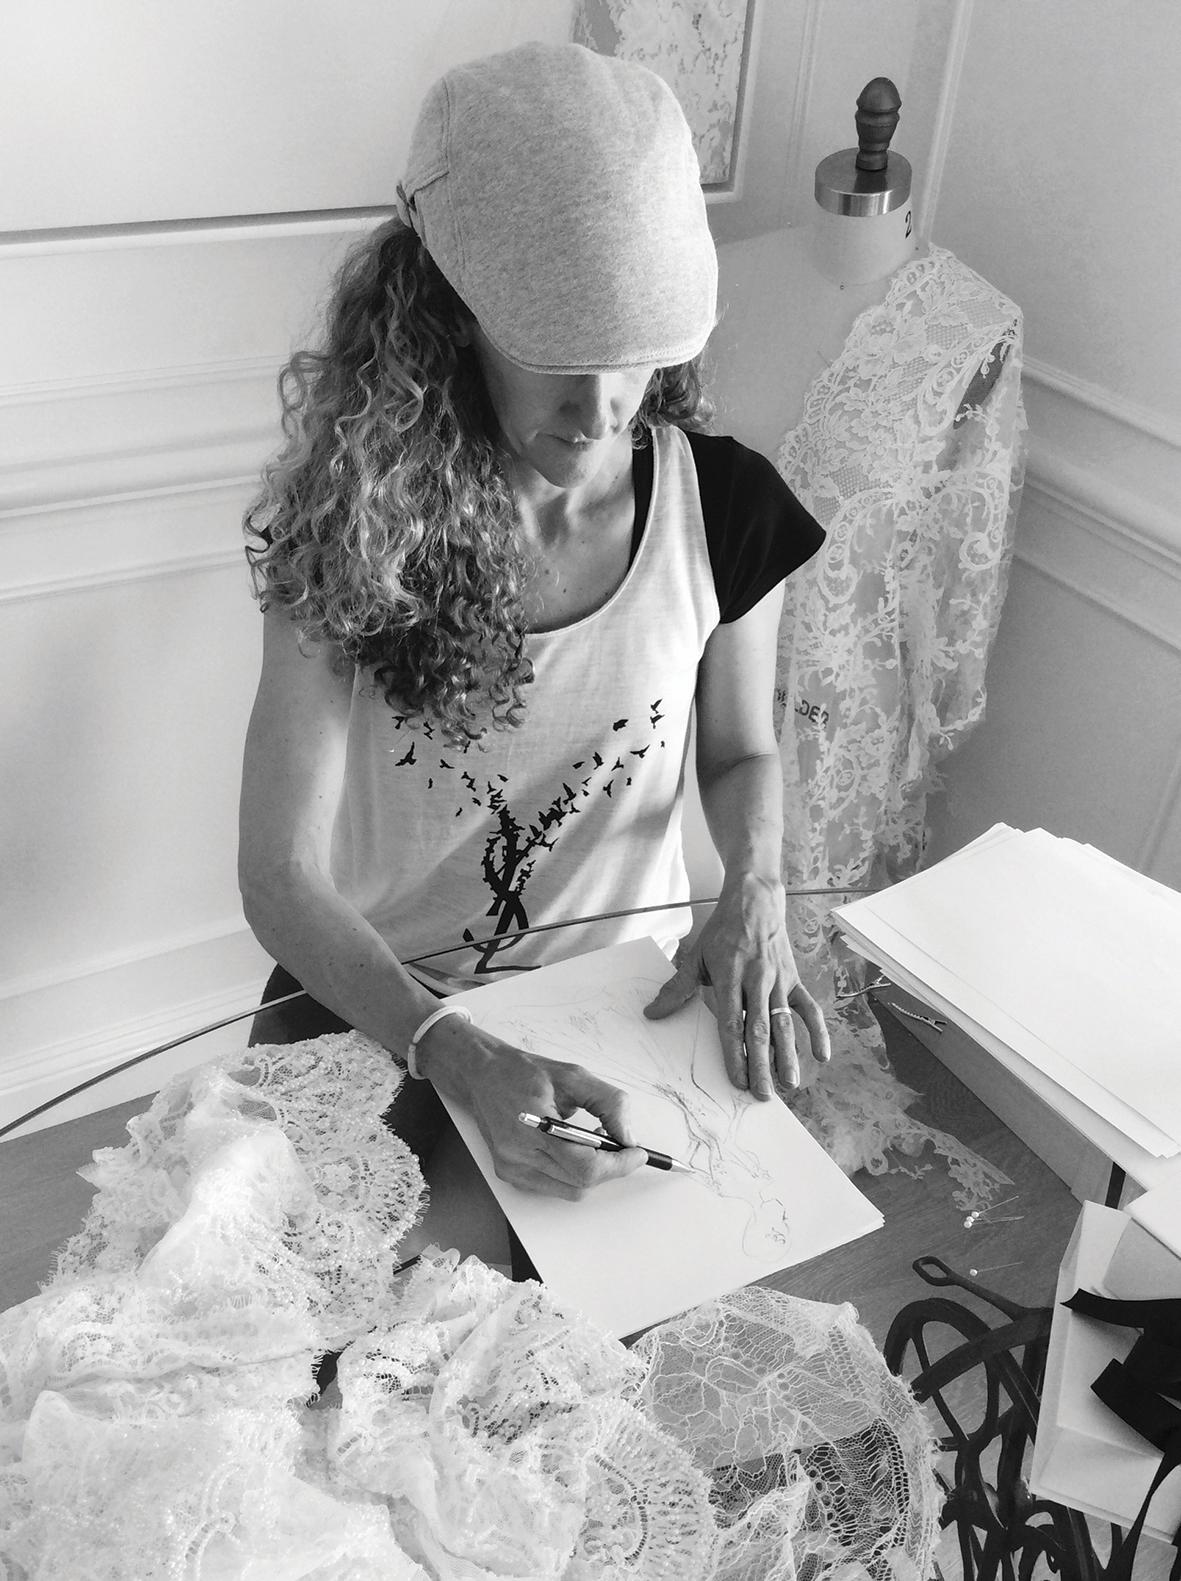 MXMCouture Weddding Dress Hand Drawn Design